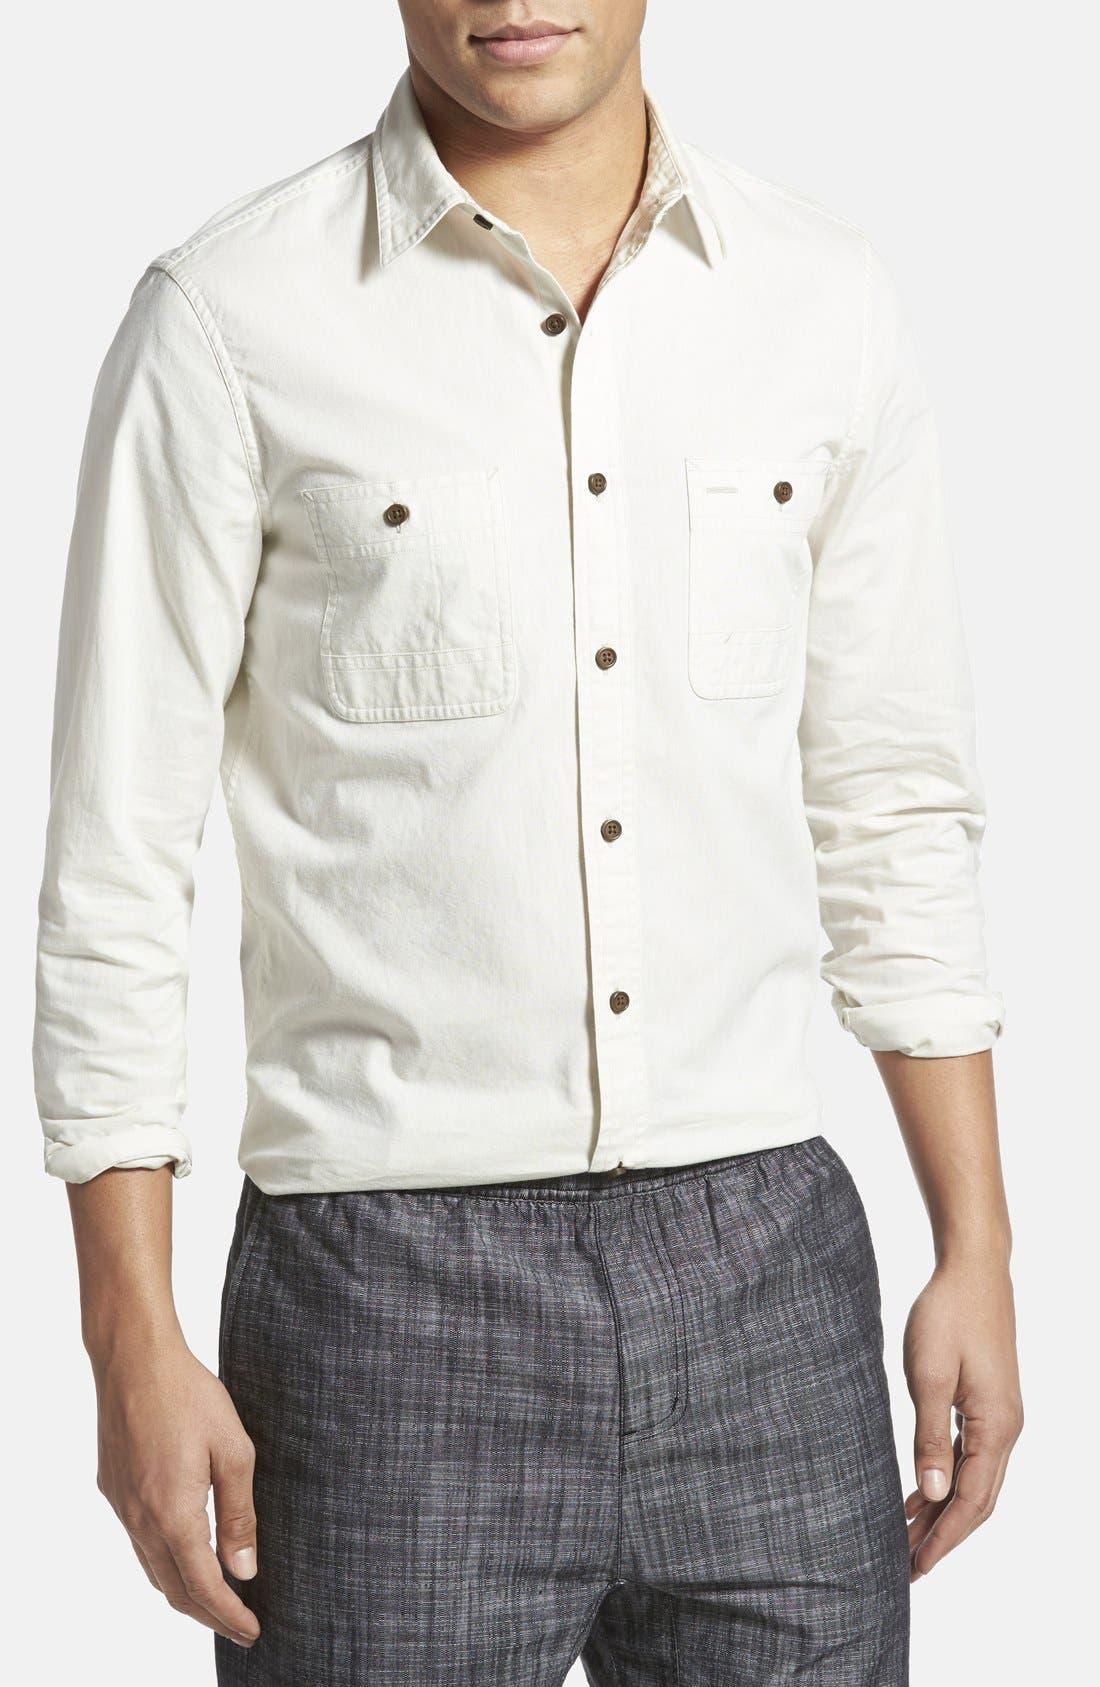 WALLIN & BROS., 'Workwear' Trim Fit Chambray Sport Shirt, Main thumbnail 1, color, 300